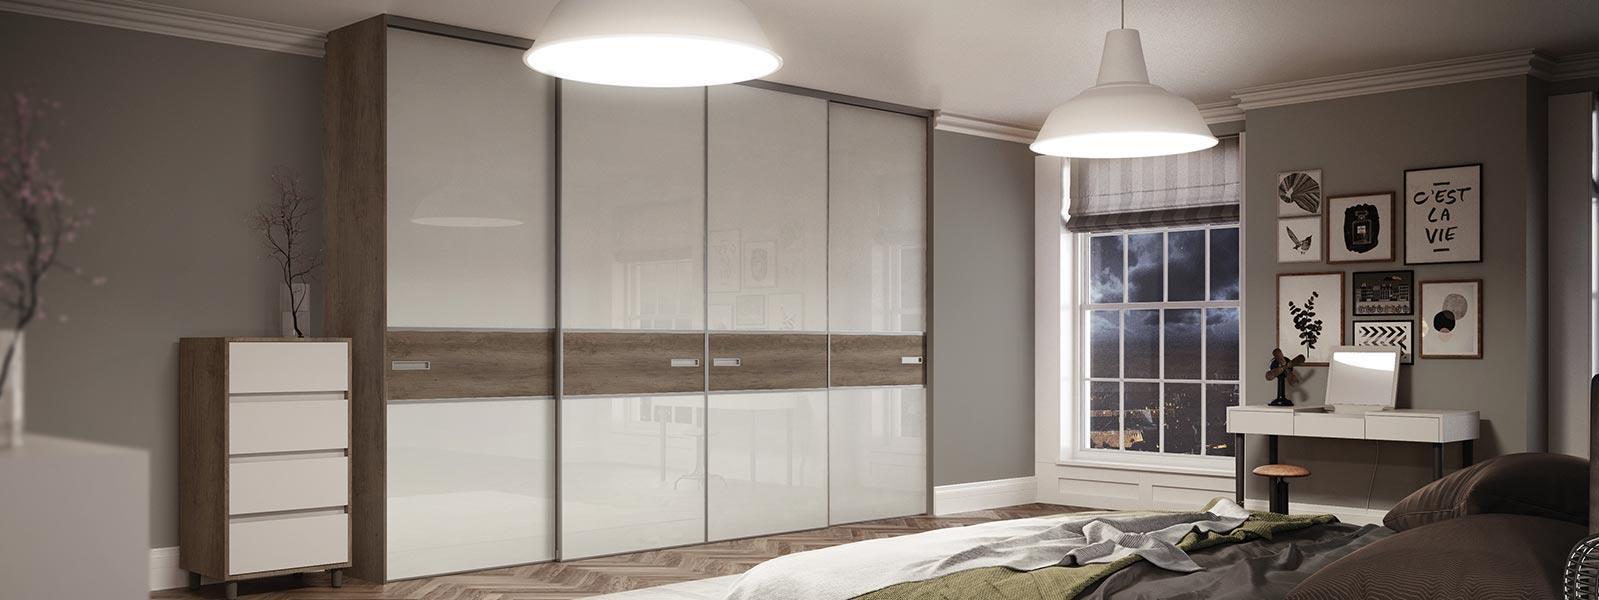 bespoke built in wardrobes, custom sliding wardrobes | spaceslide